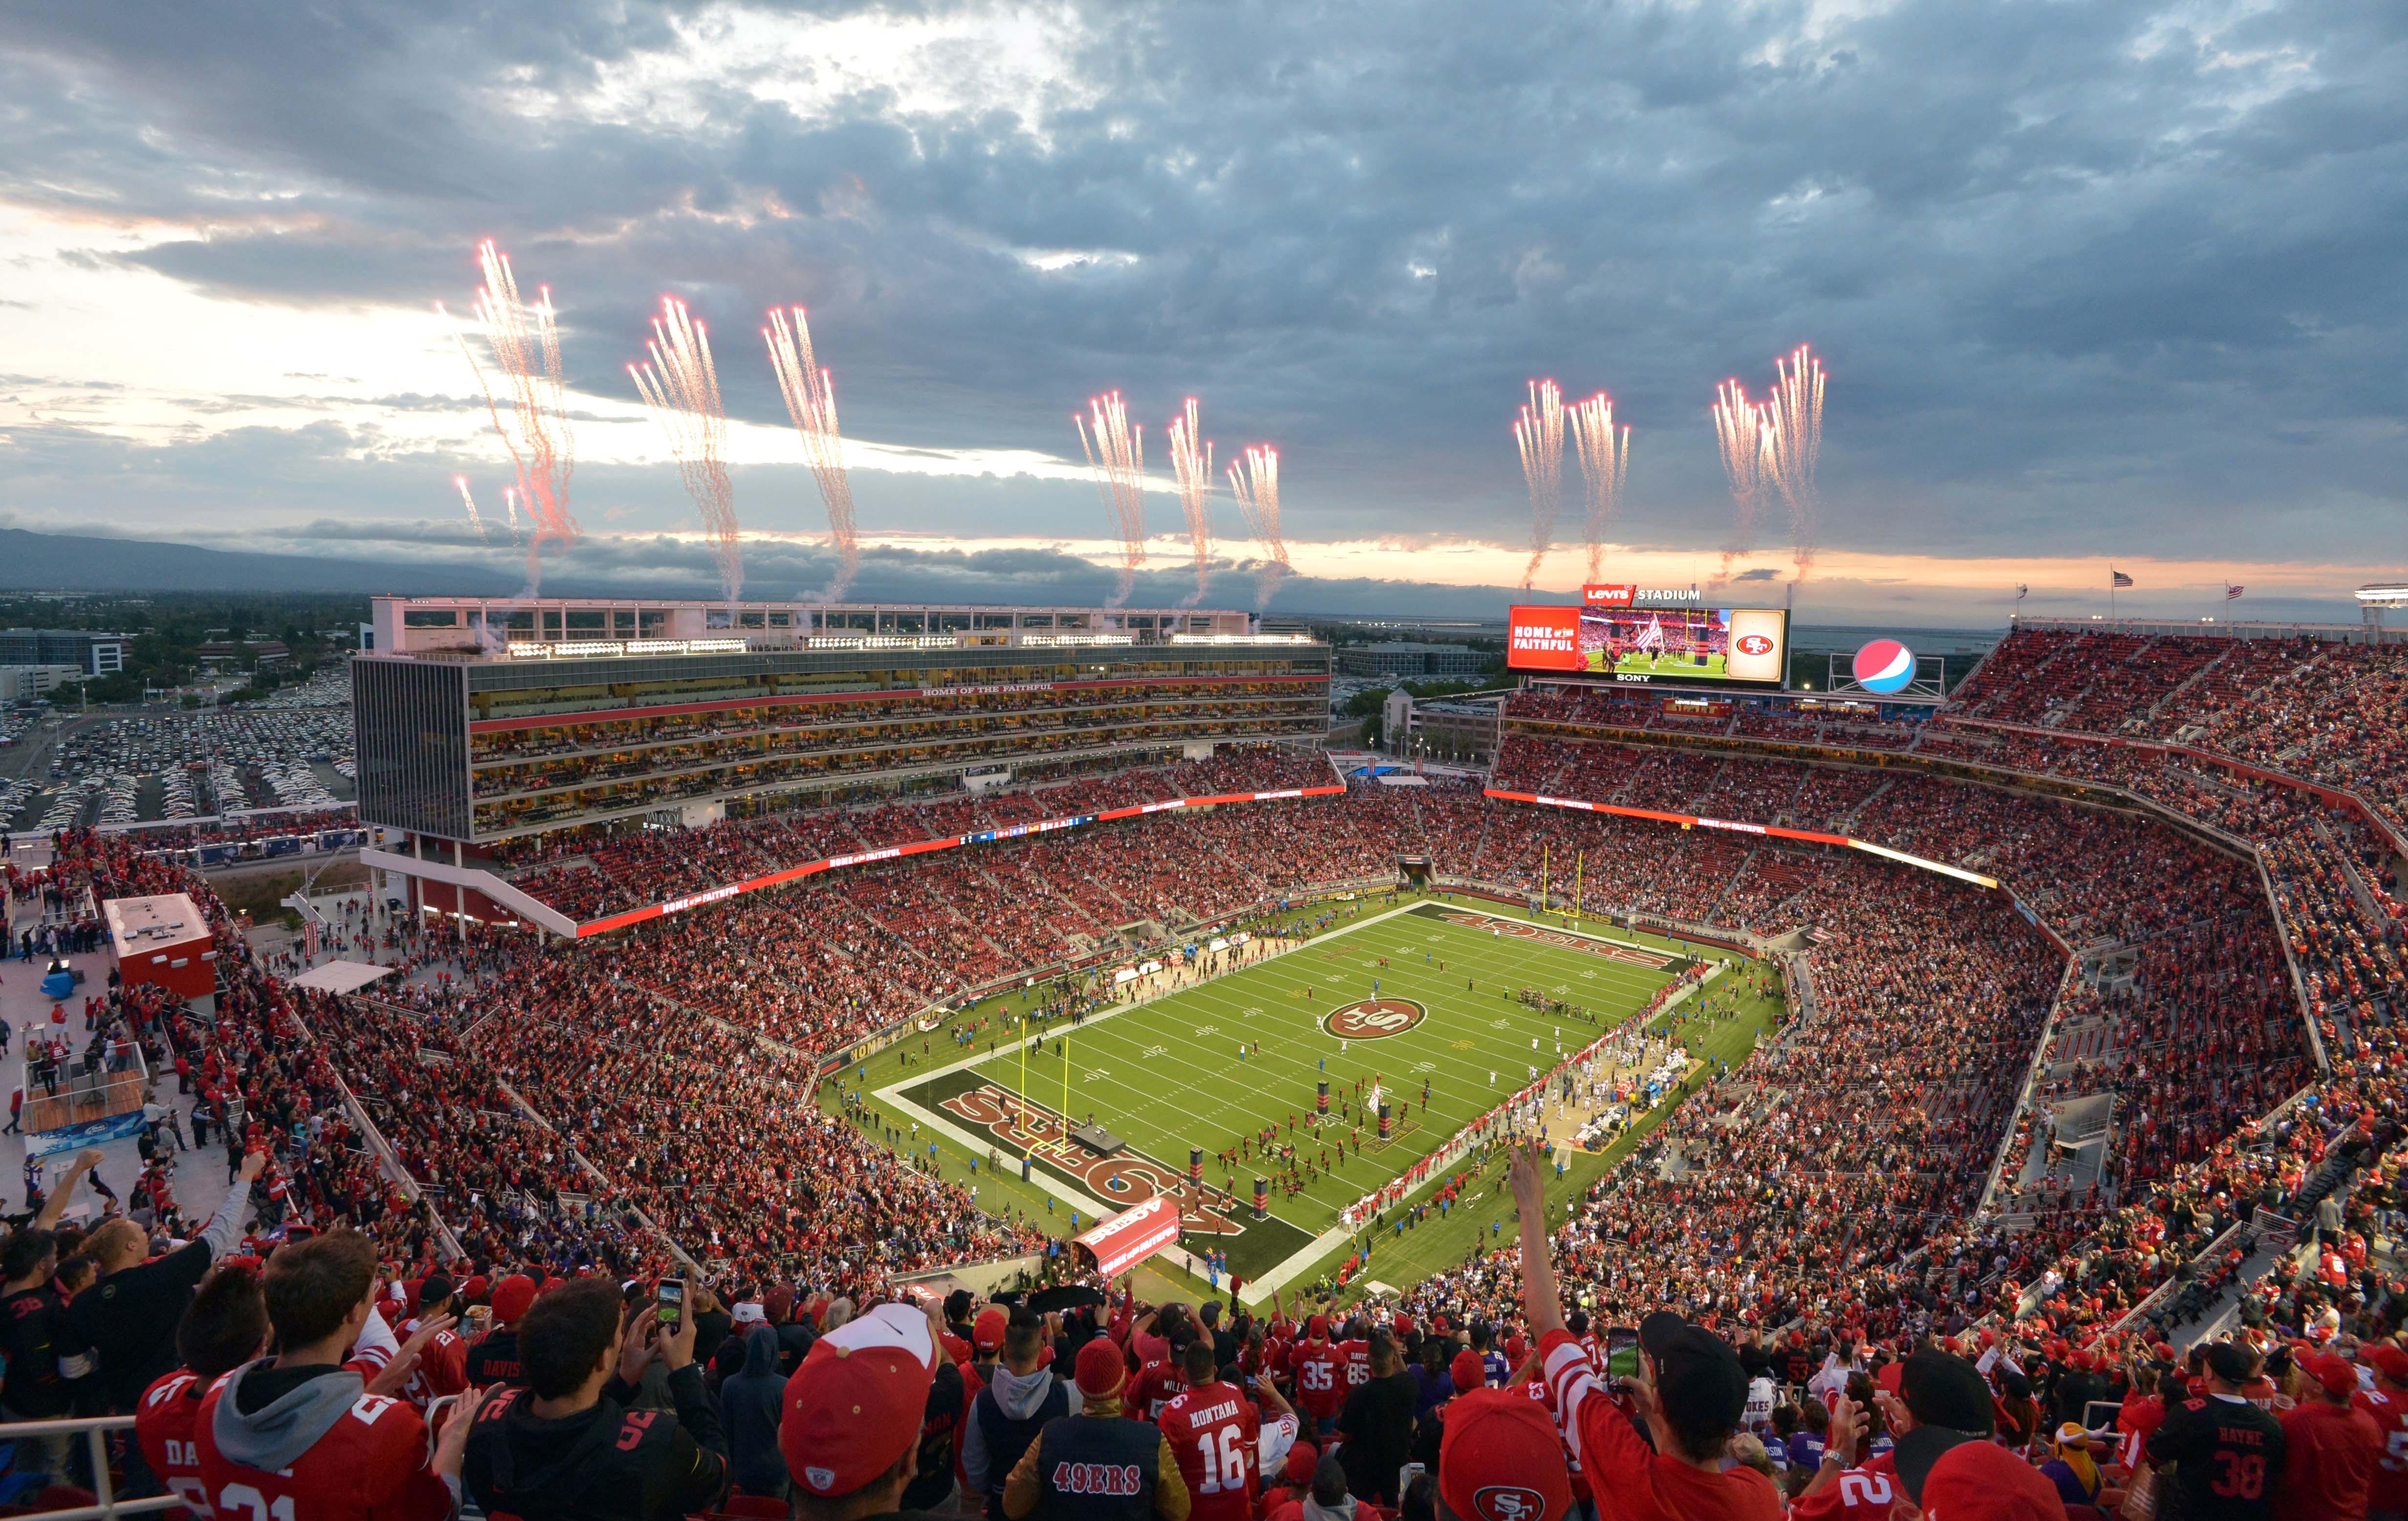 49ers announce 2017 regular season schedule